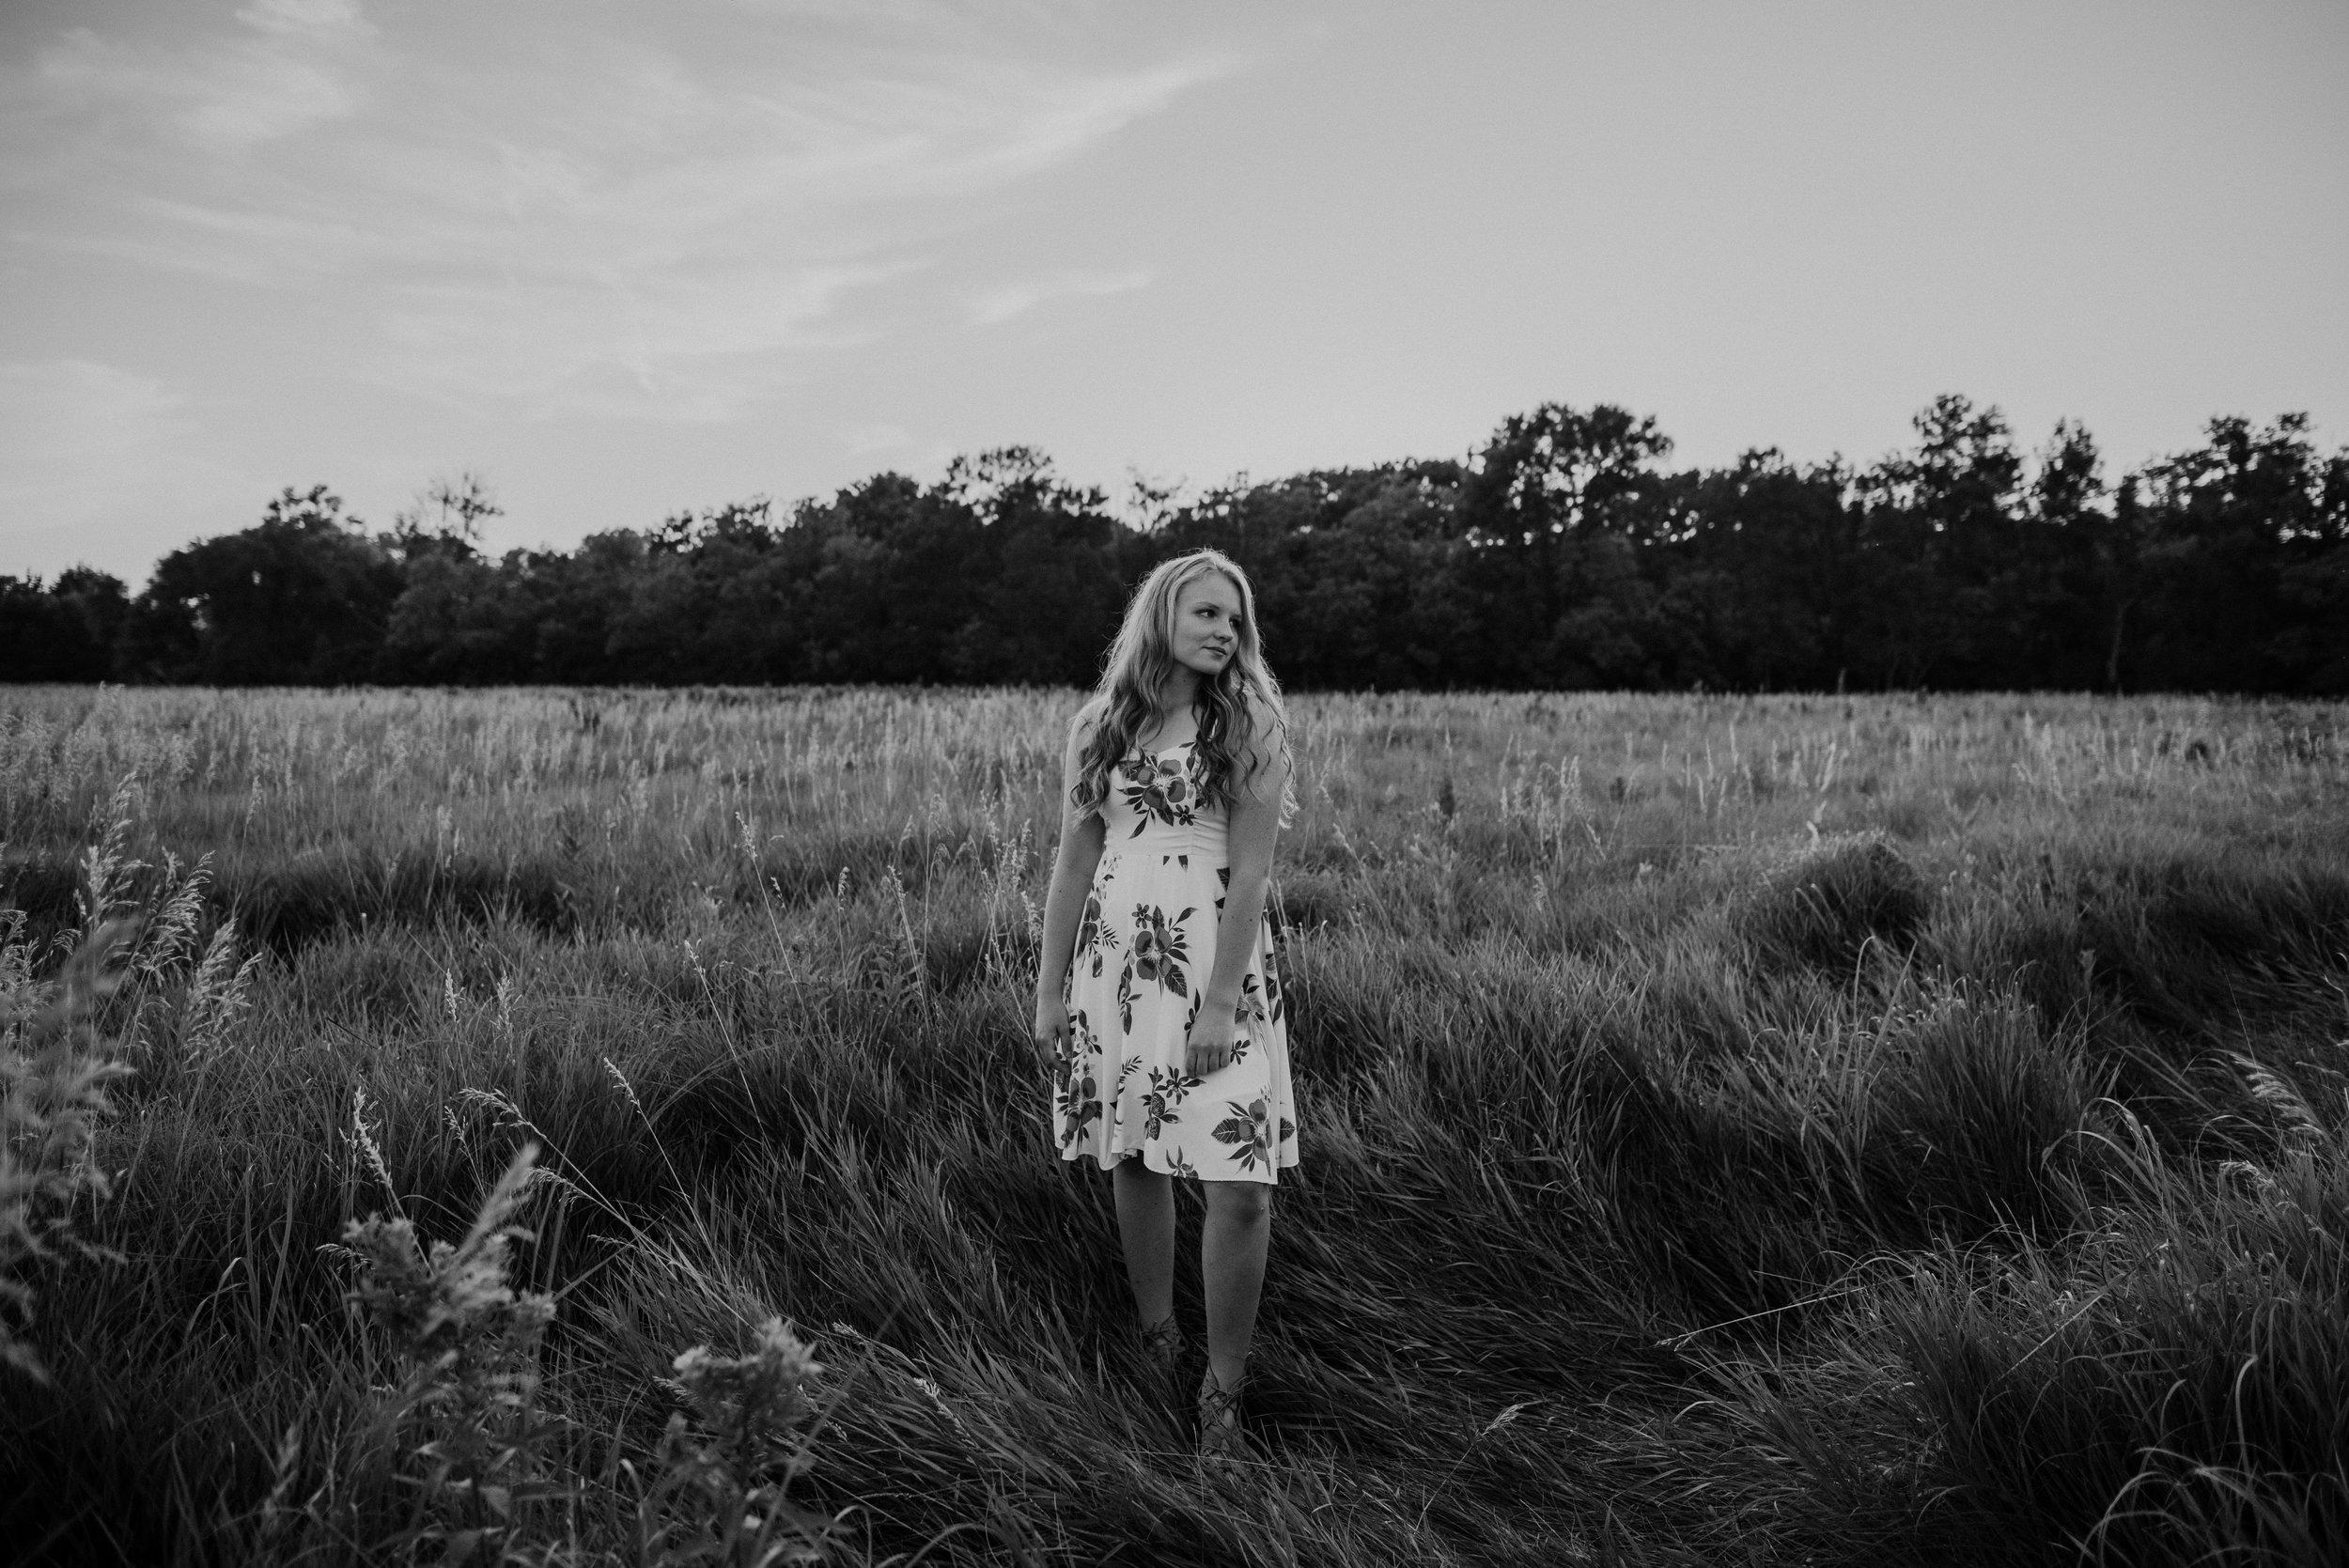 Kaylie-Sirek-Photography-Grand-Island-Nebraska-Senior-016.jpg